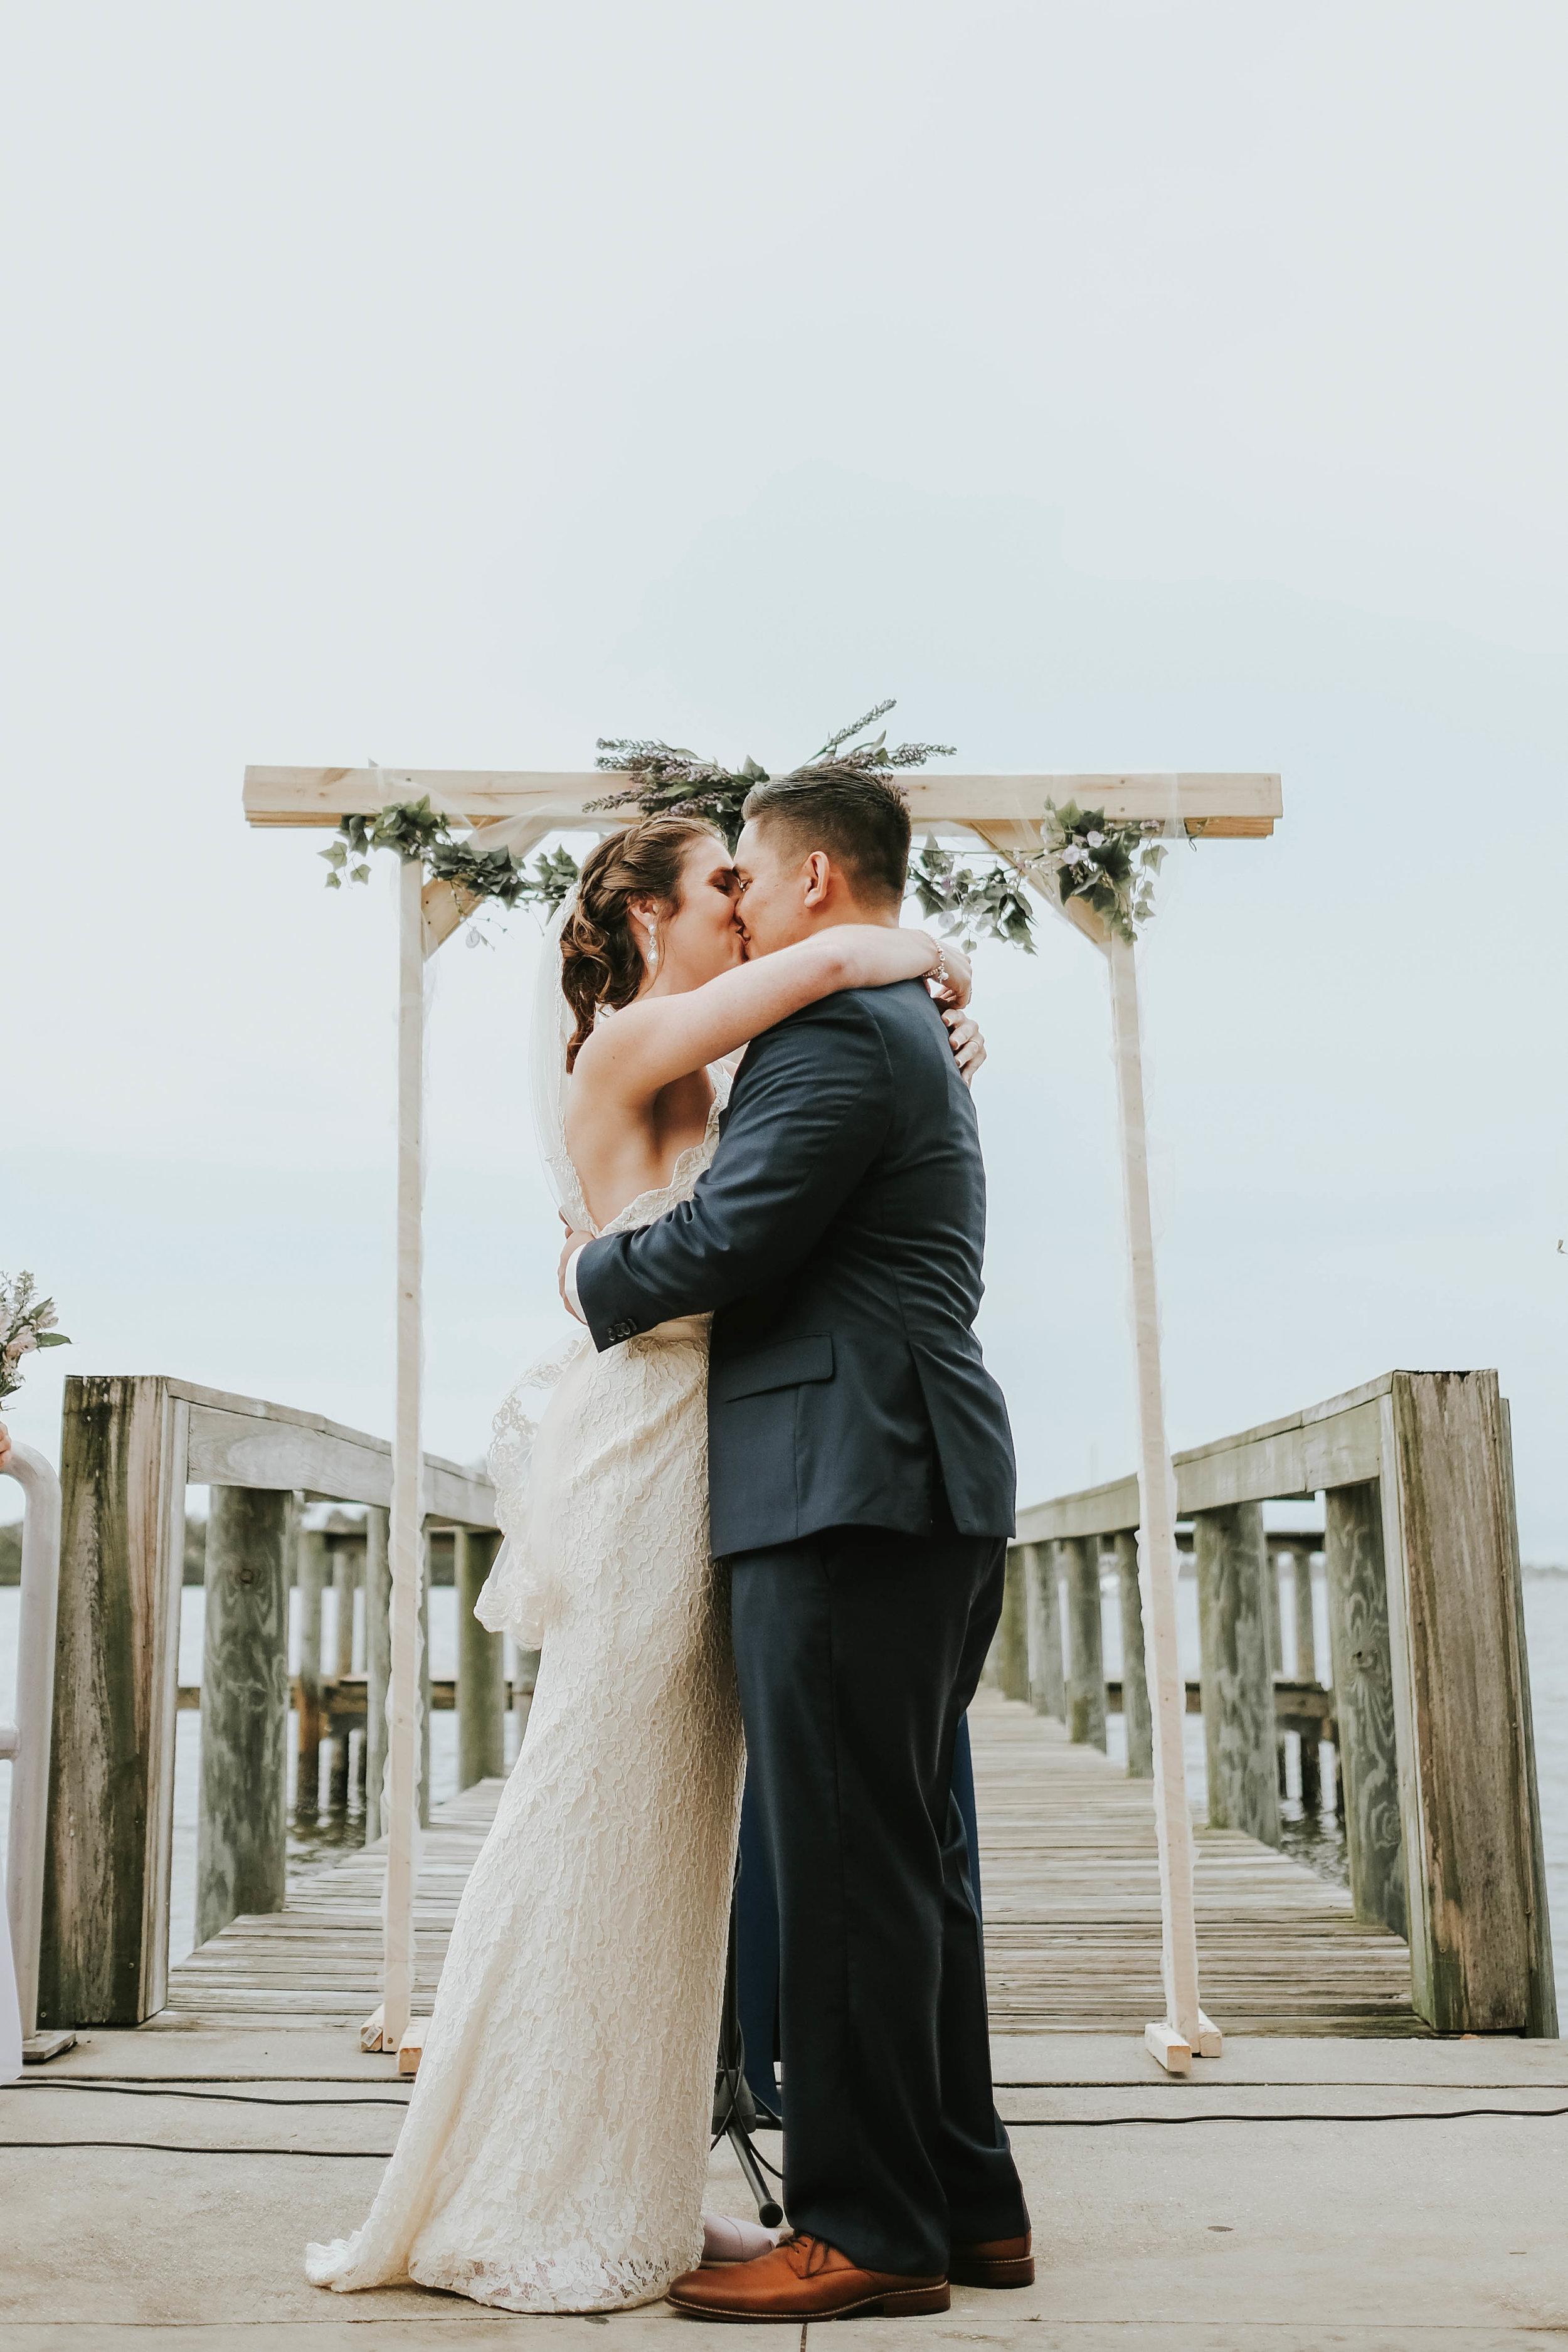 Bride and groom kiss front street wedding melbourne FL